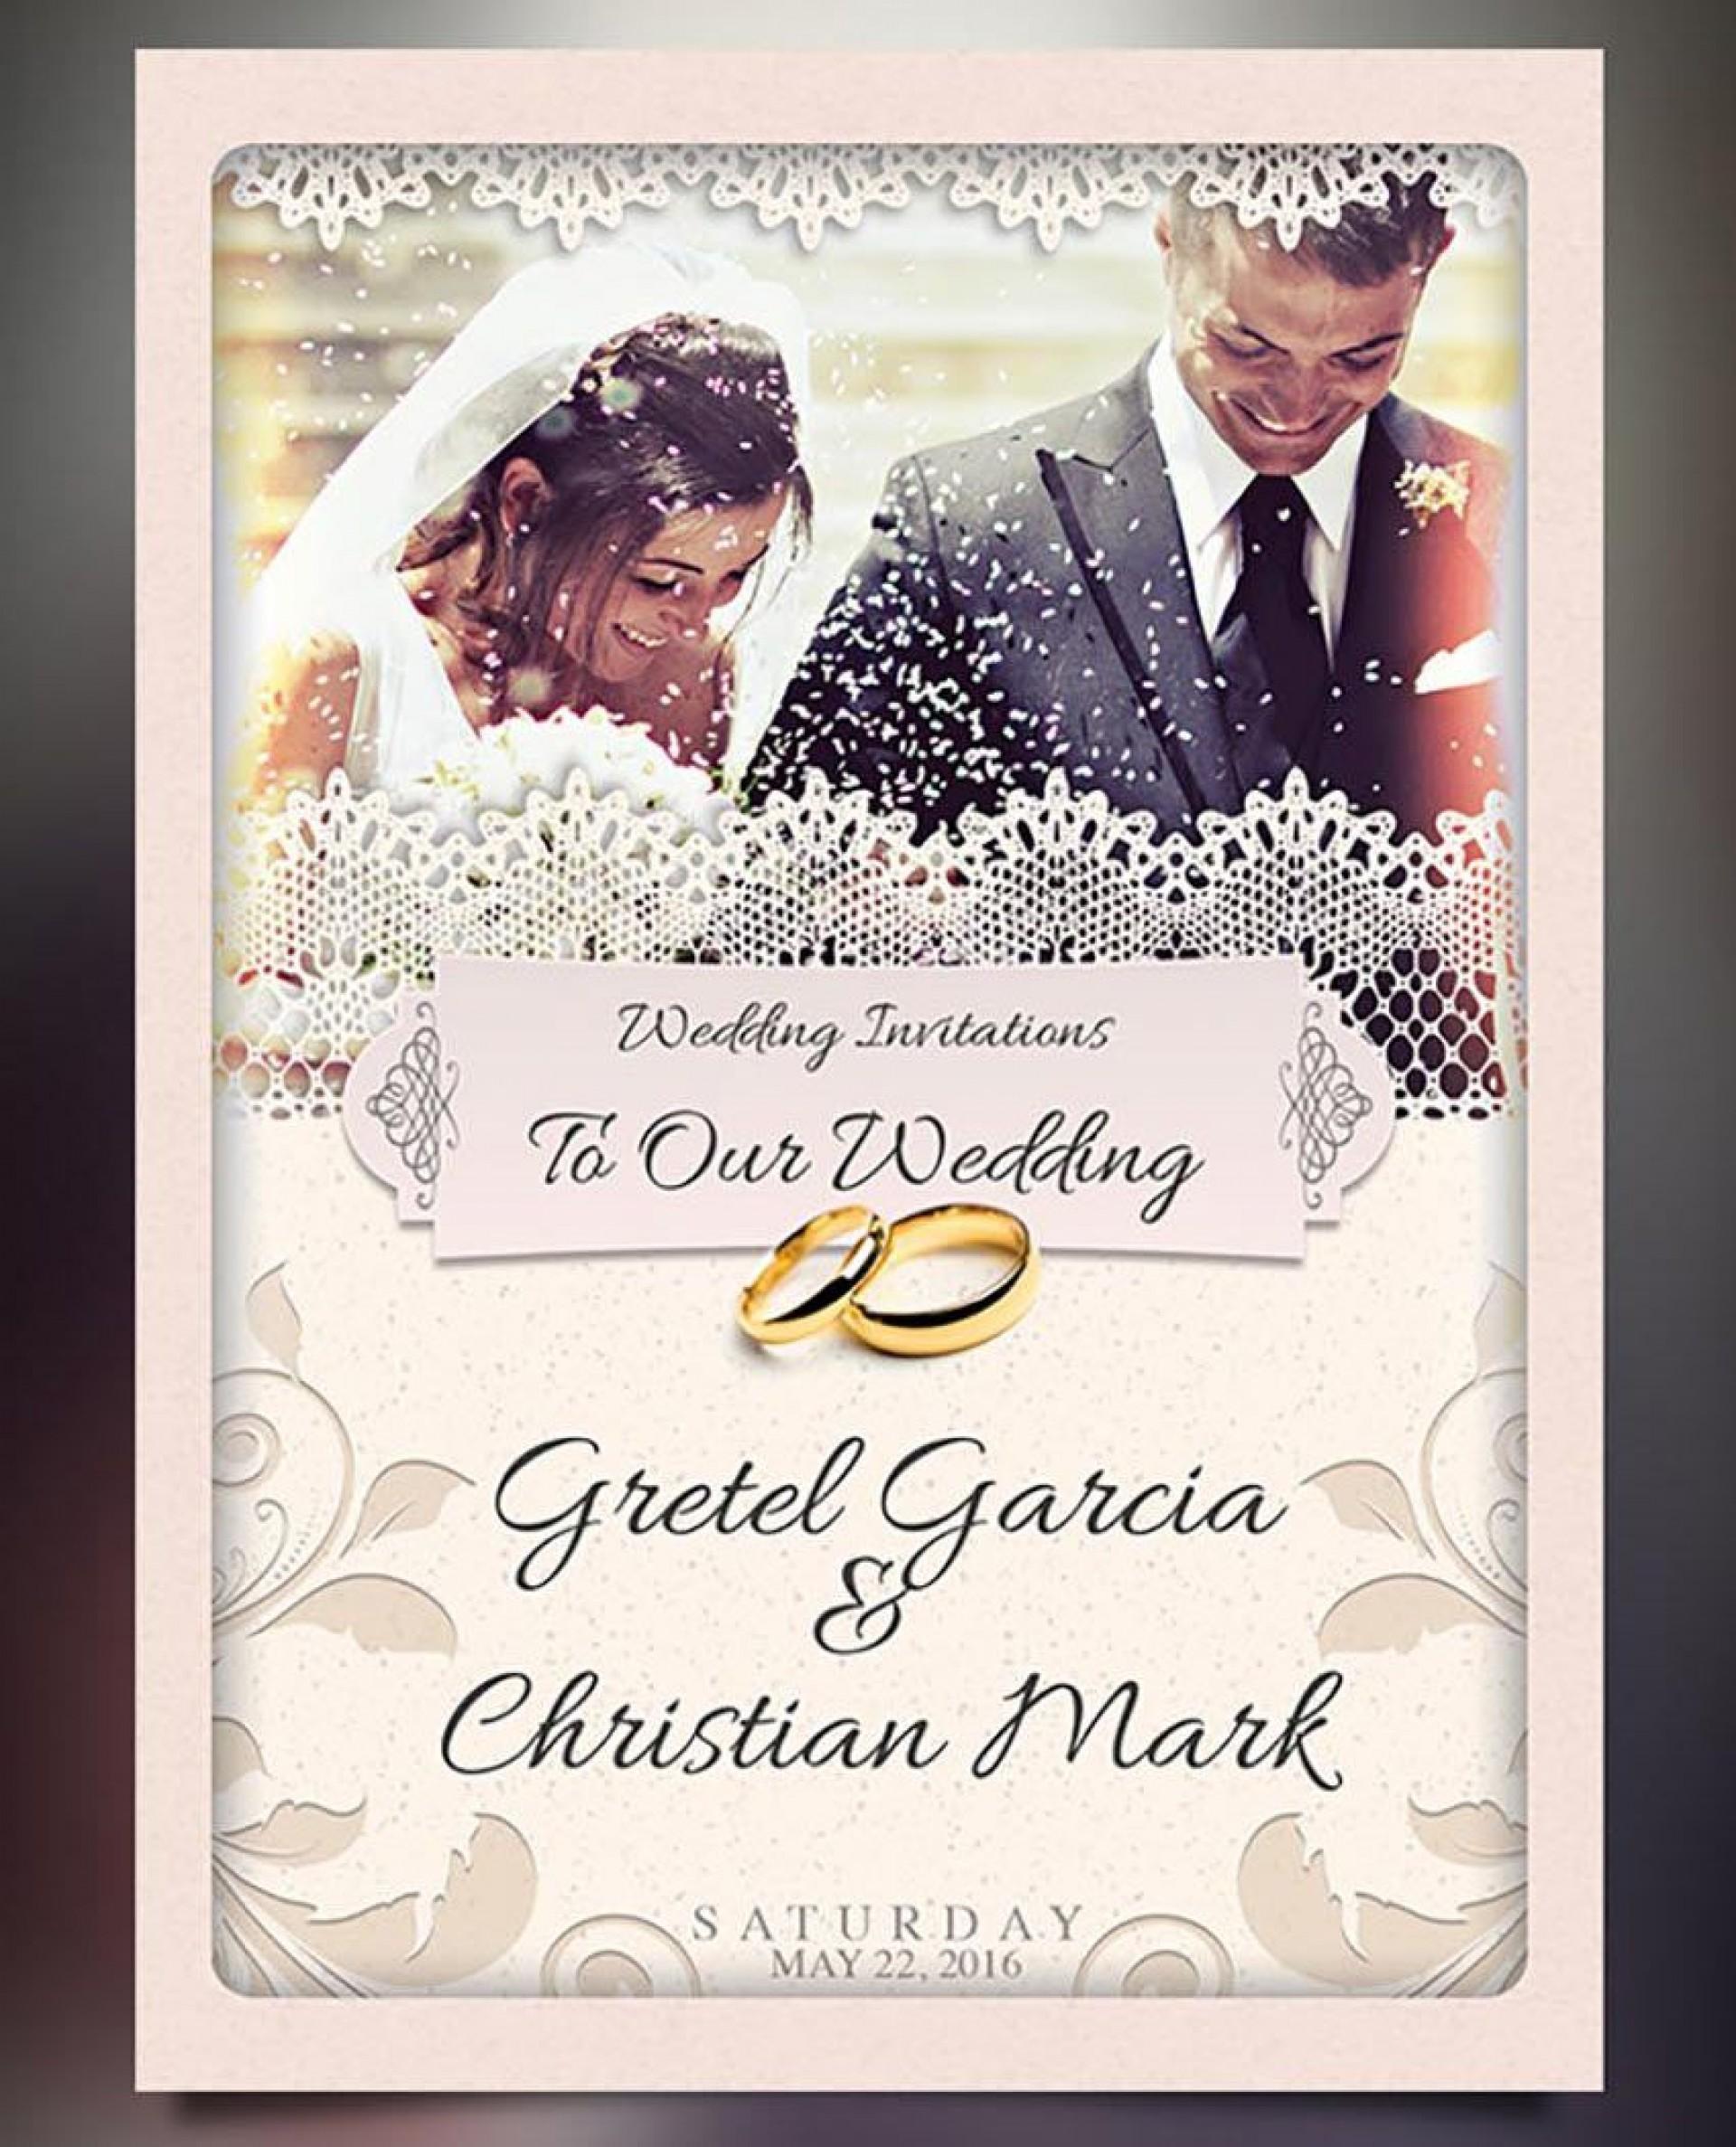 008 Incredible Photoshop Wedding Invitation Template Image  Templates Hindu Psd Free Download Card1920